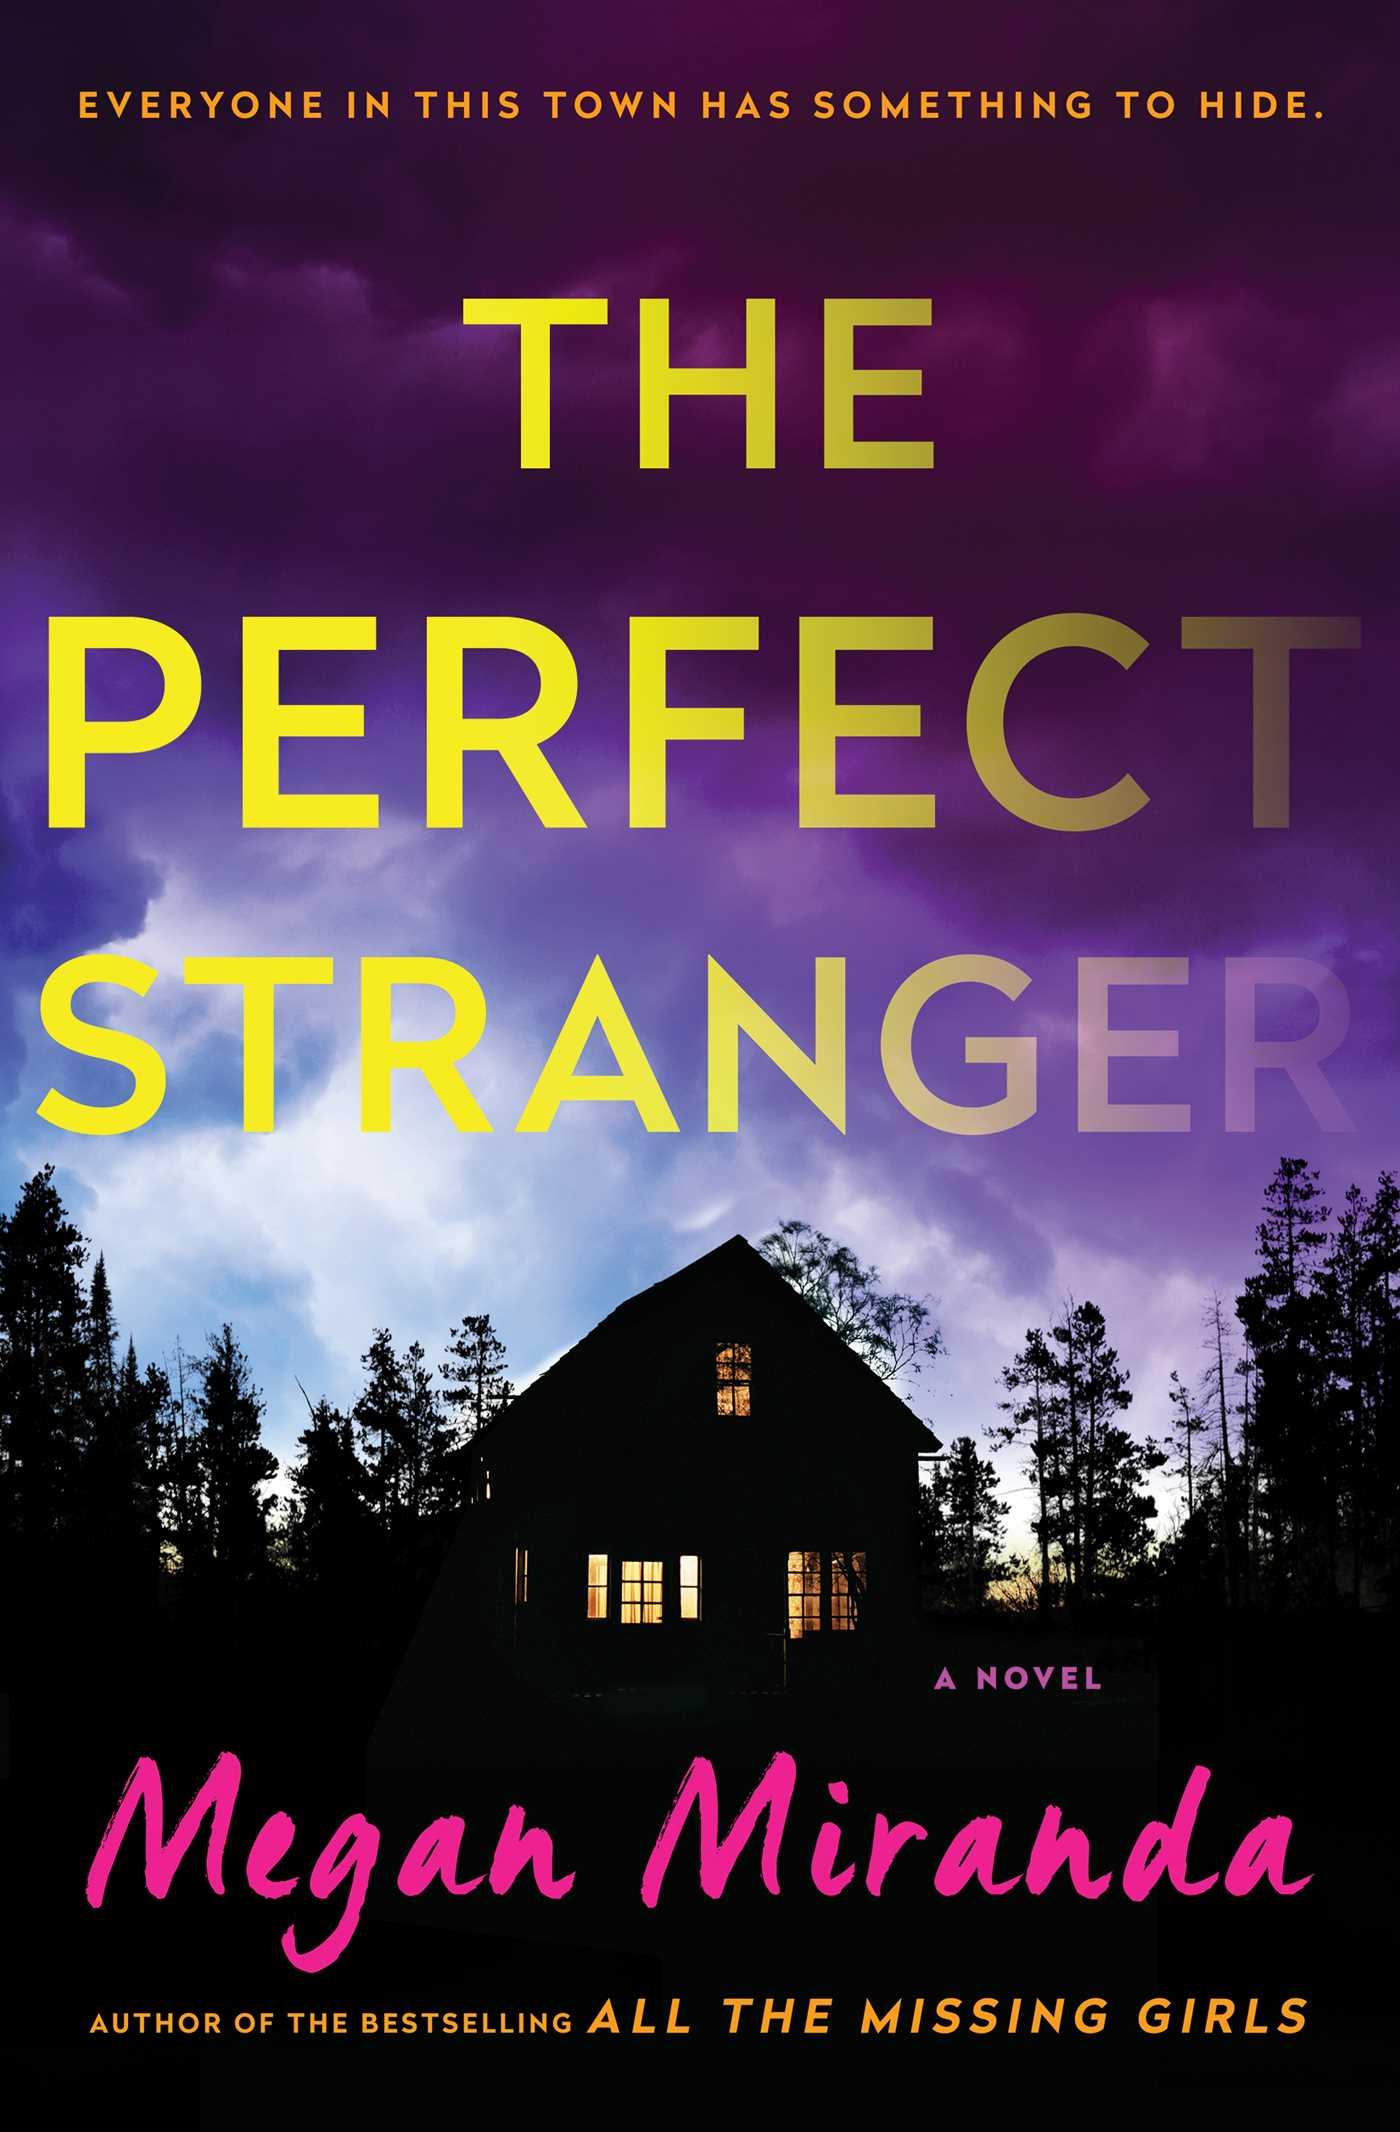 The perfect stranger 9781501166822 hr